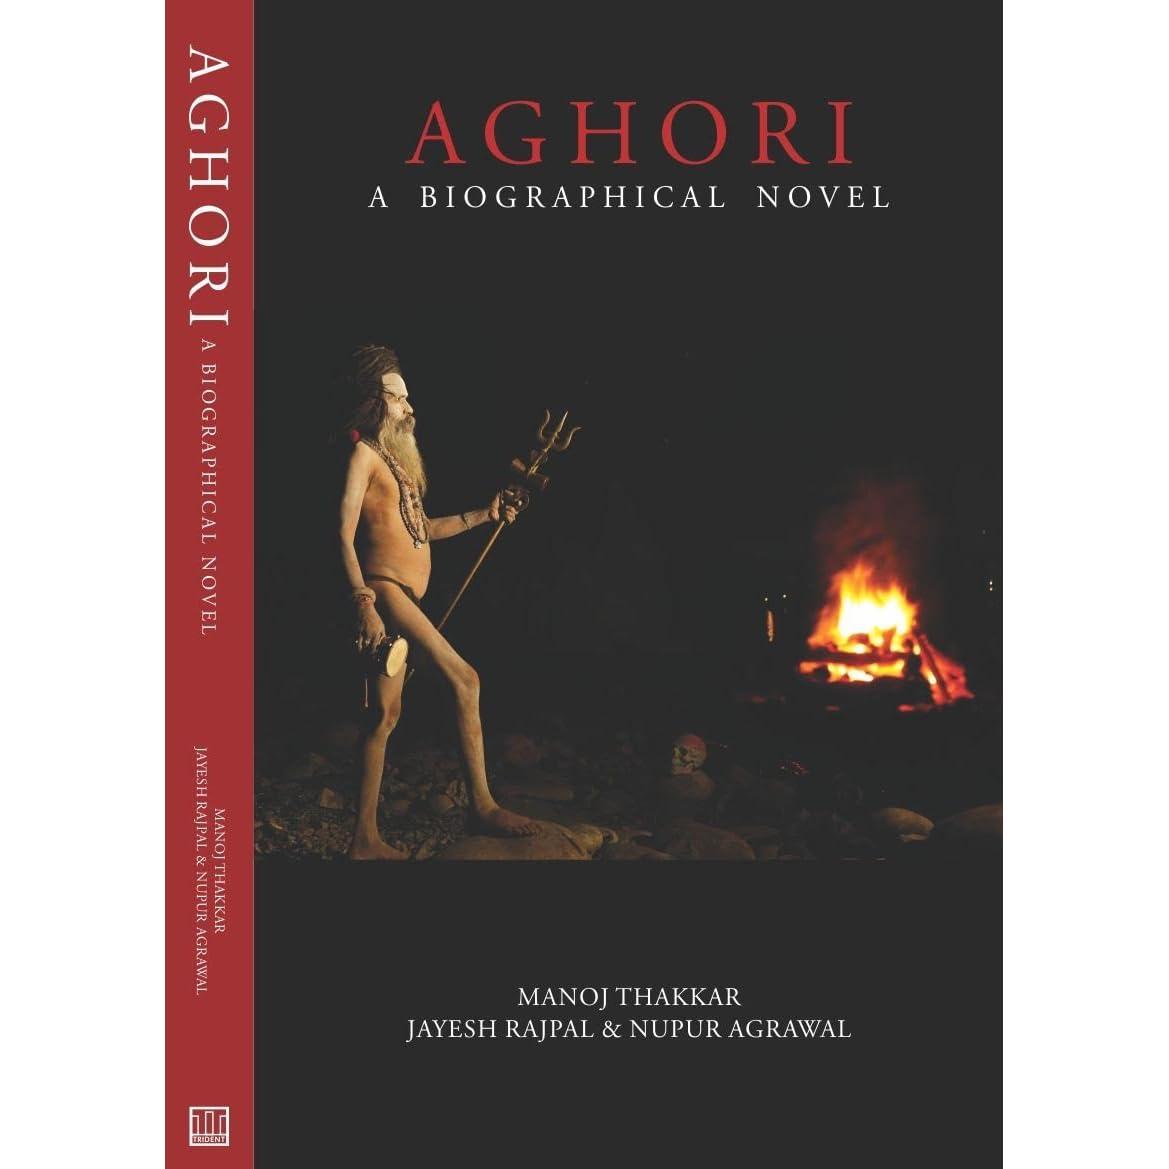 Aghori: A Biographcal Novel by Manoj Thakkar